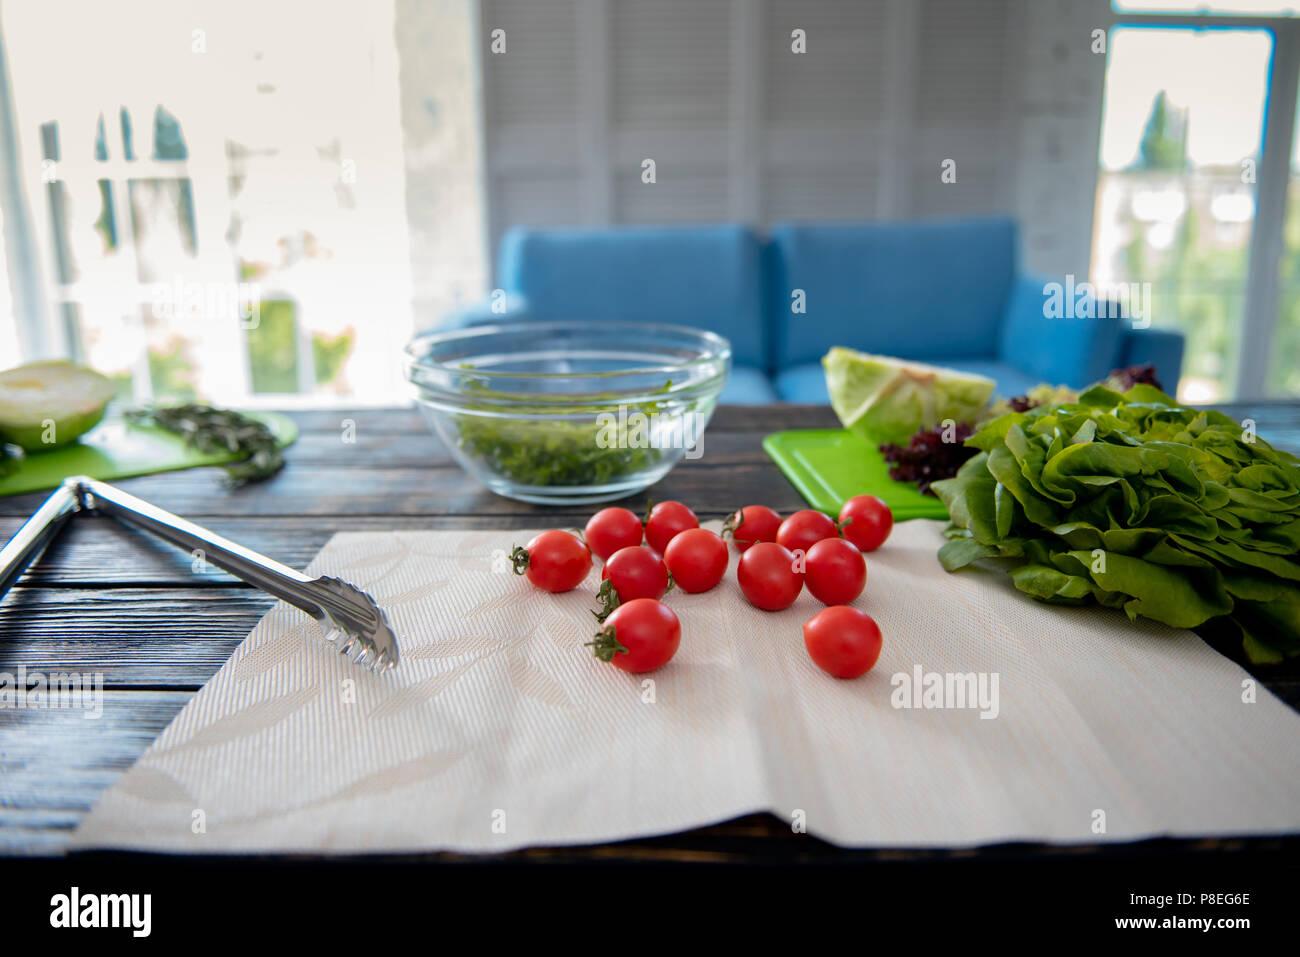 Savory cherry tomatoes lying on the napkin - Stock Image